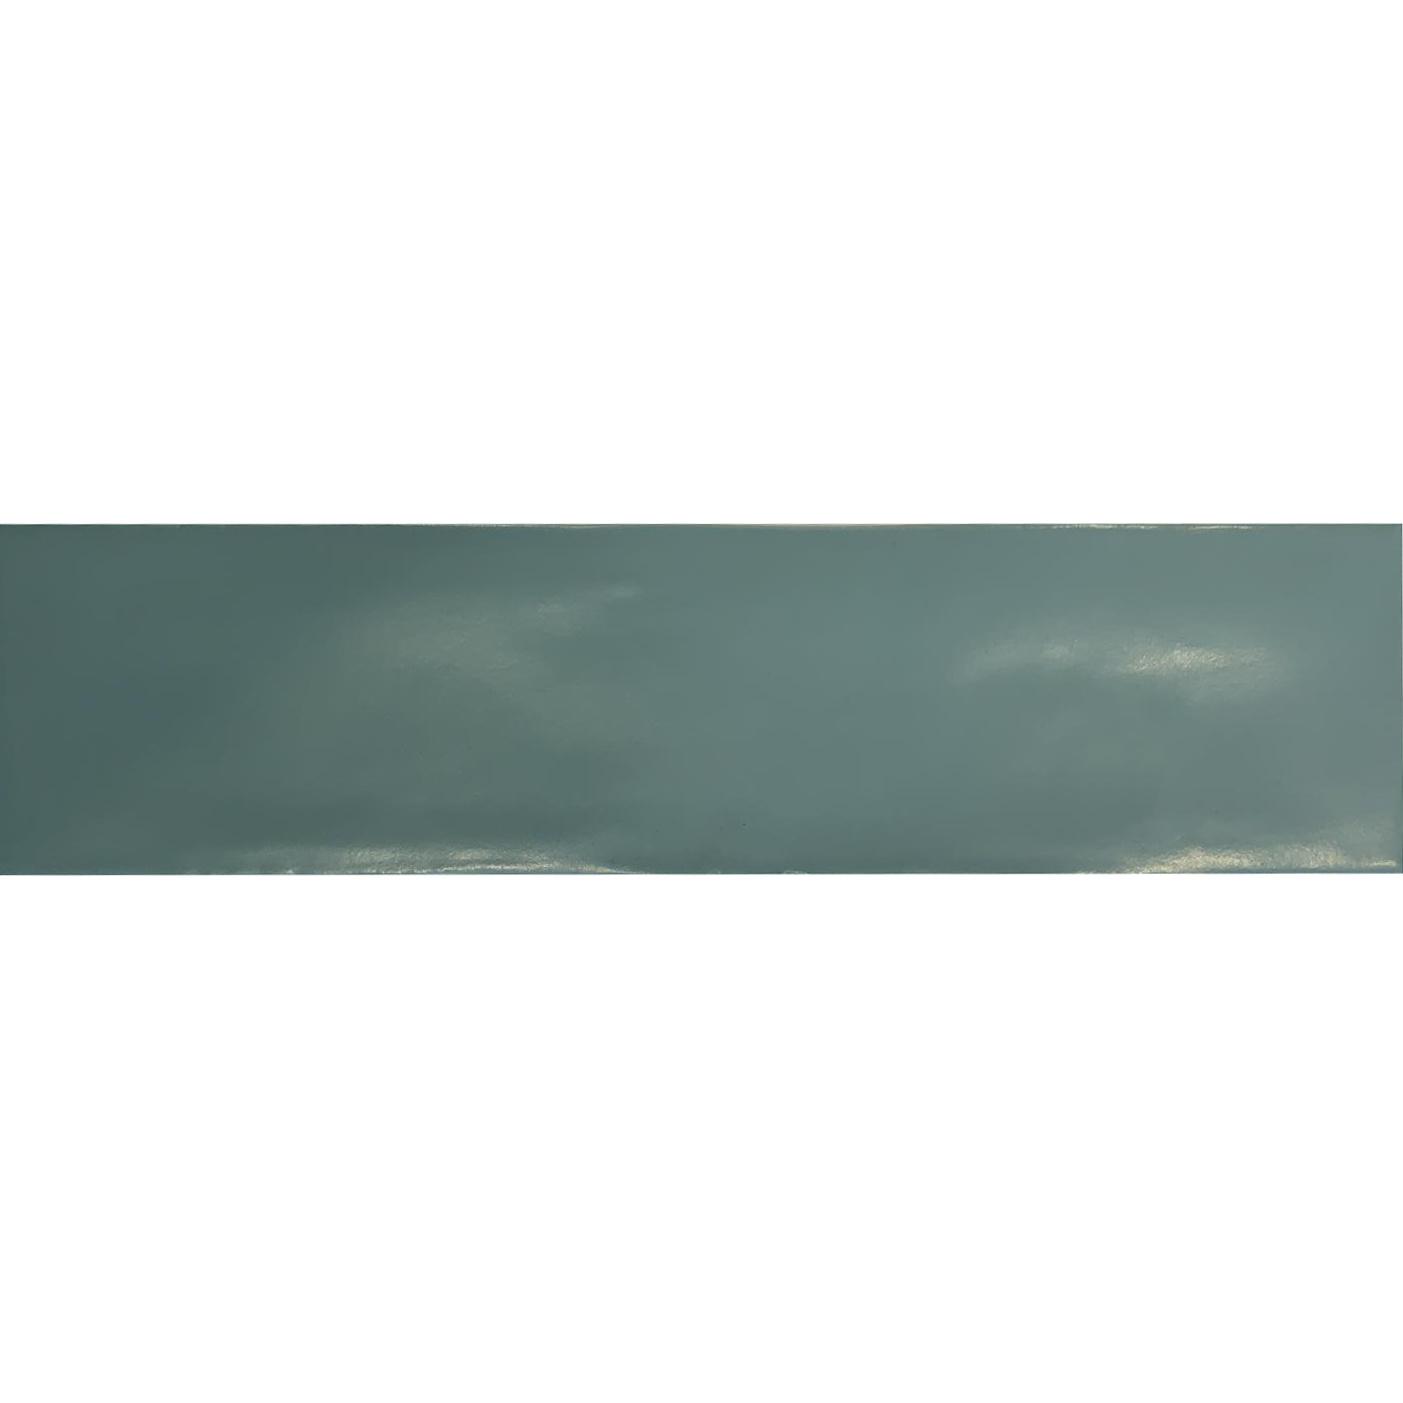 Wandtegel Tebe Vintage 7.5x30 cm Mat Jade Groen Tebe